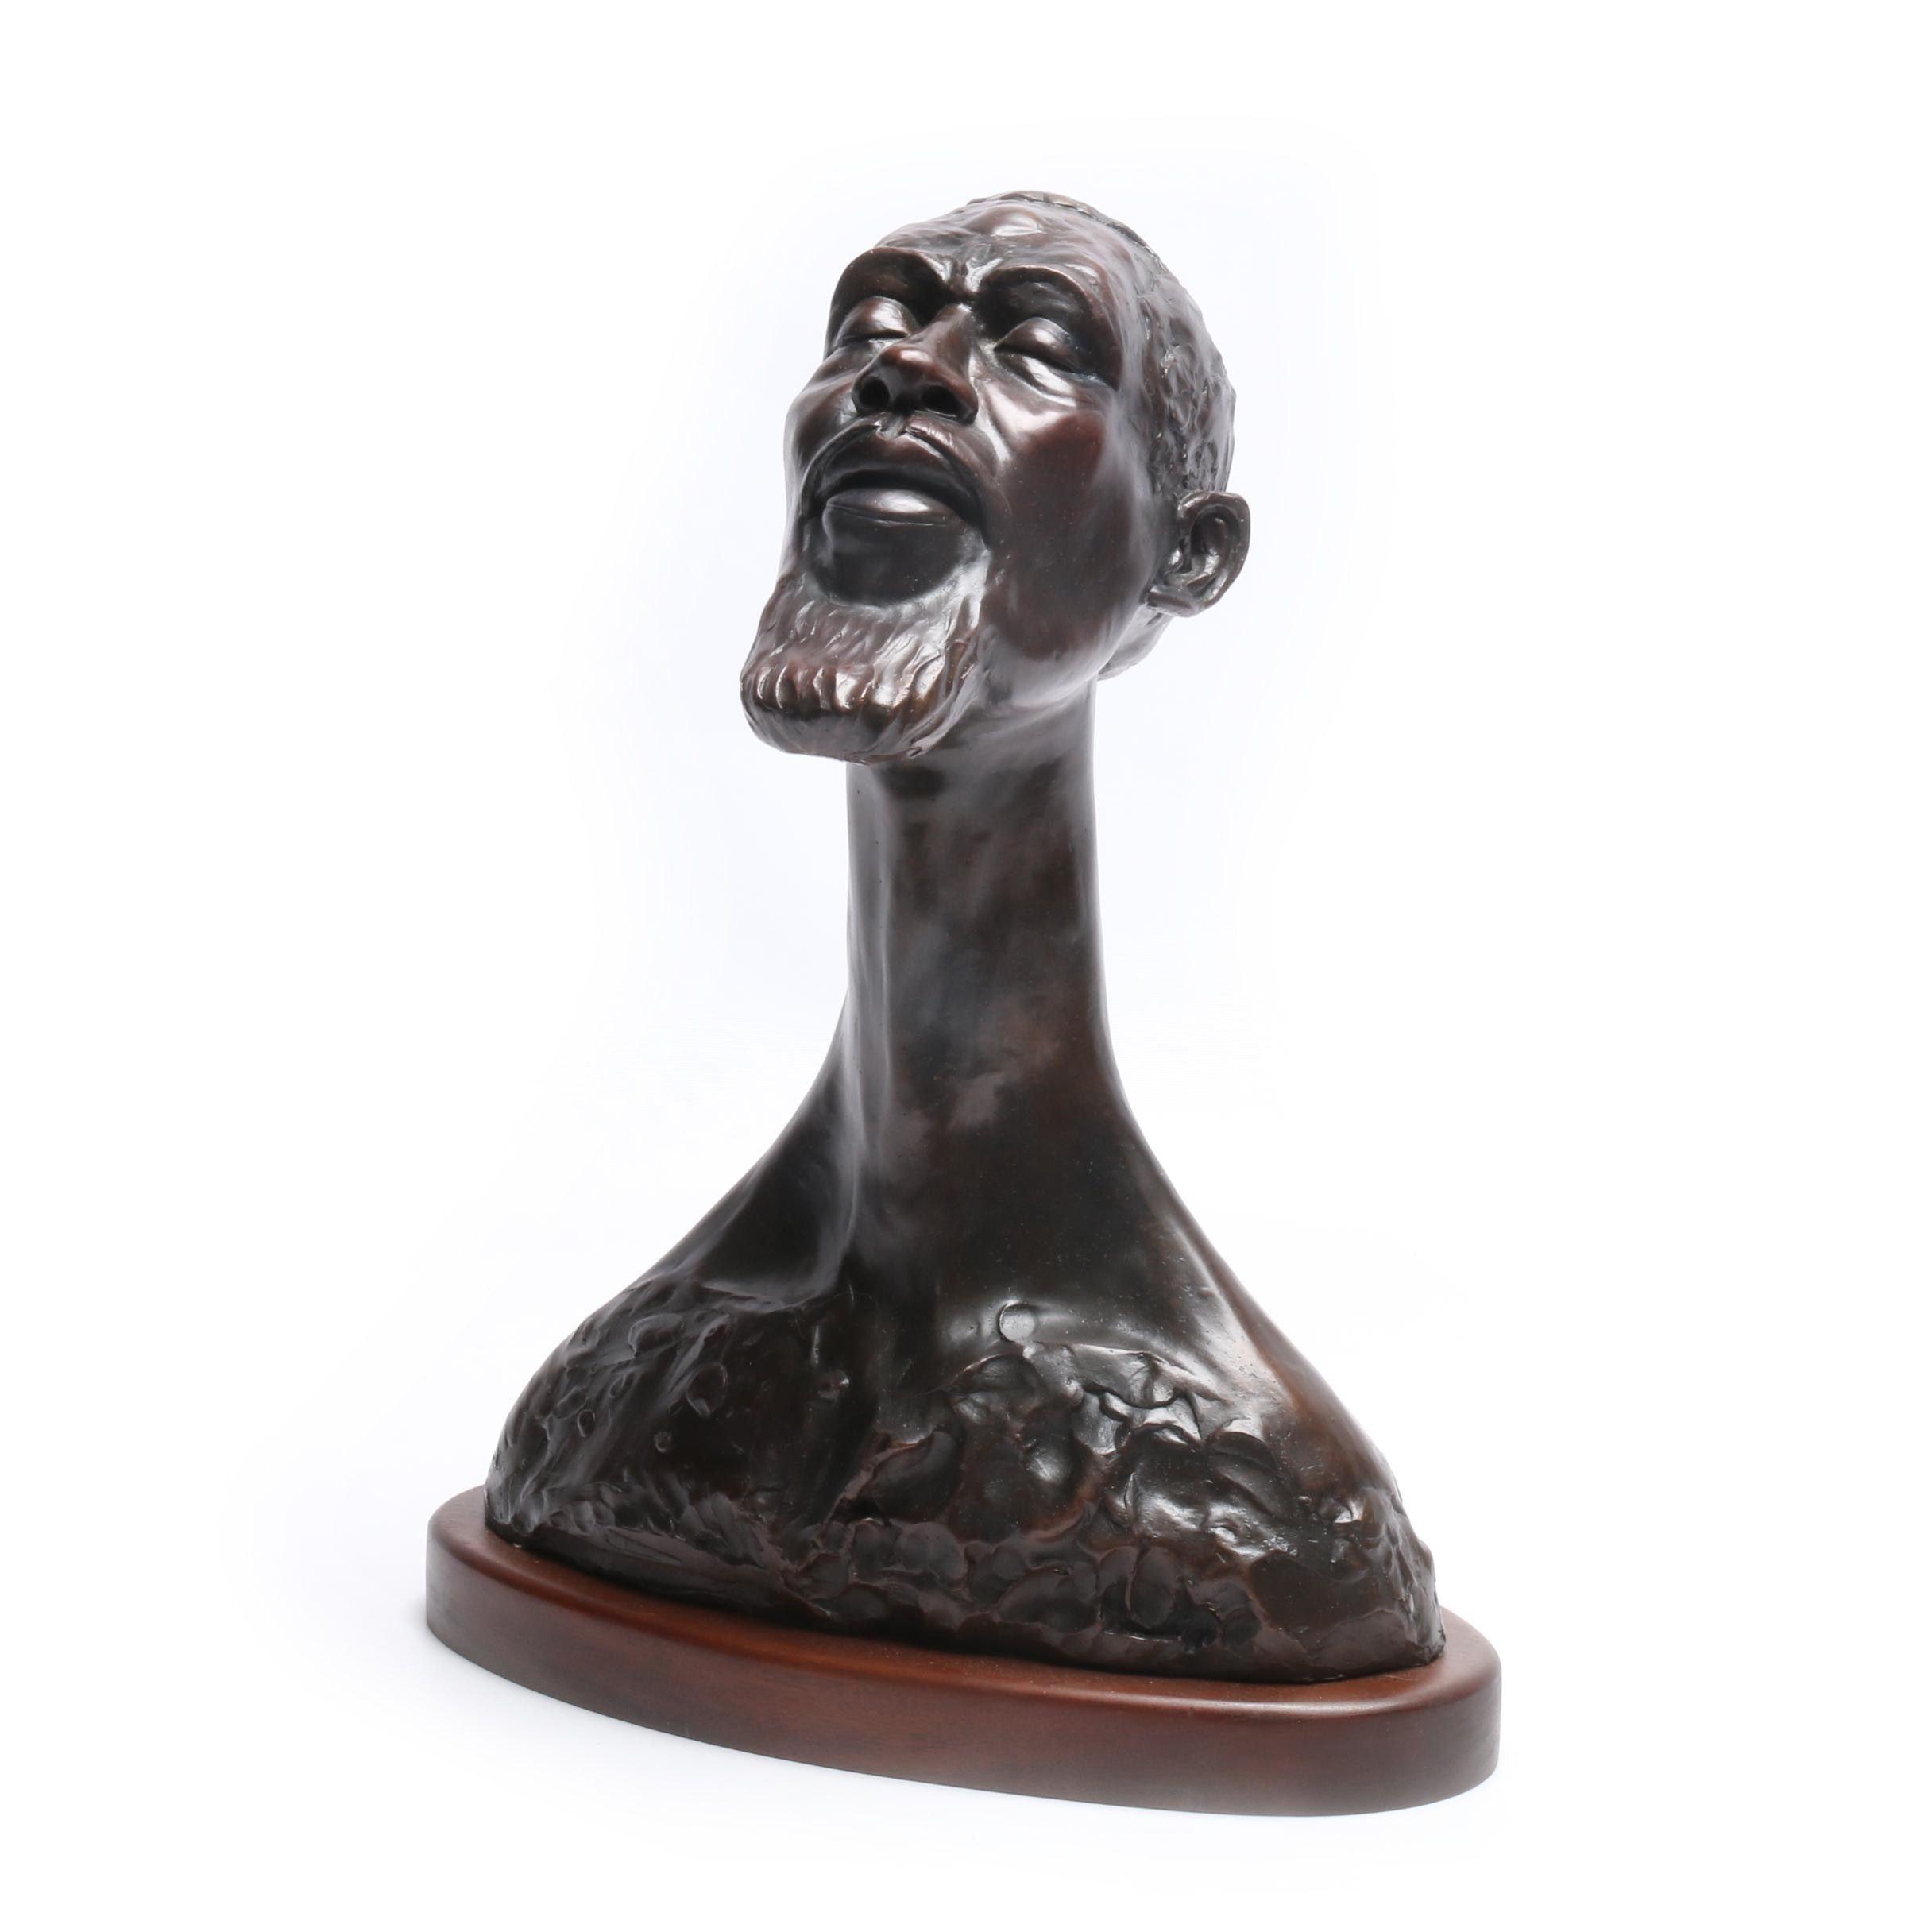 J. Leontakianakis Cast Bronze Sculpture